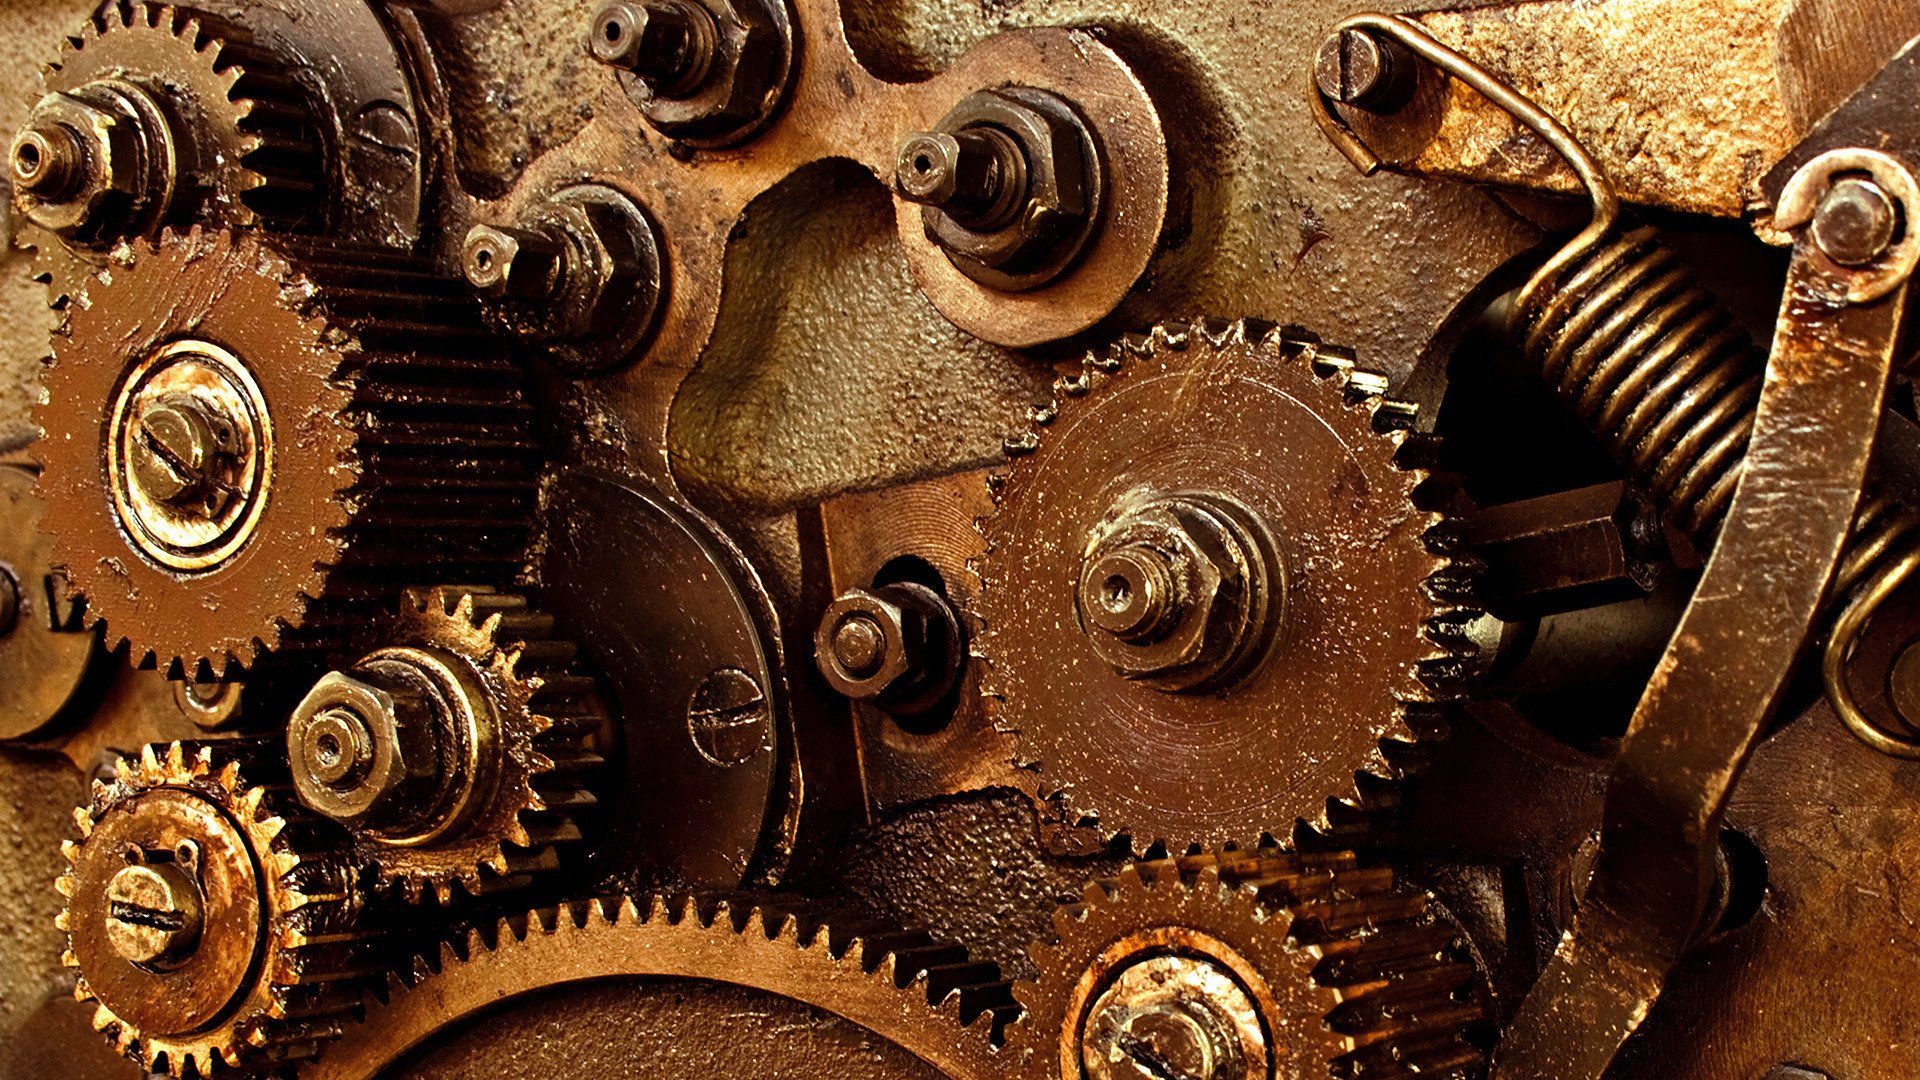 machine Engineering gear wallpaper 1920x1080 597426 WallpaperUP 1920x1080